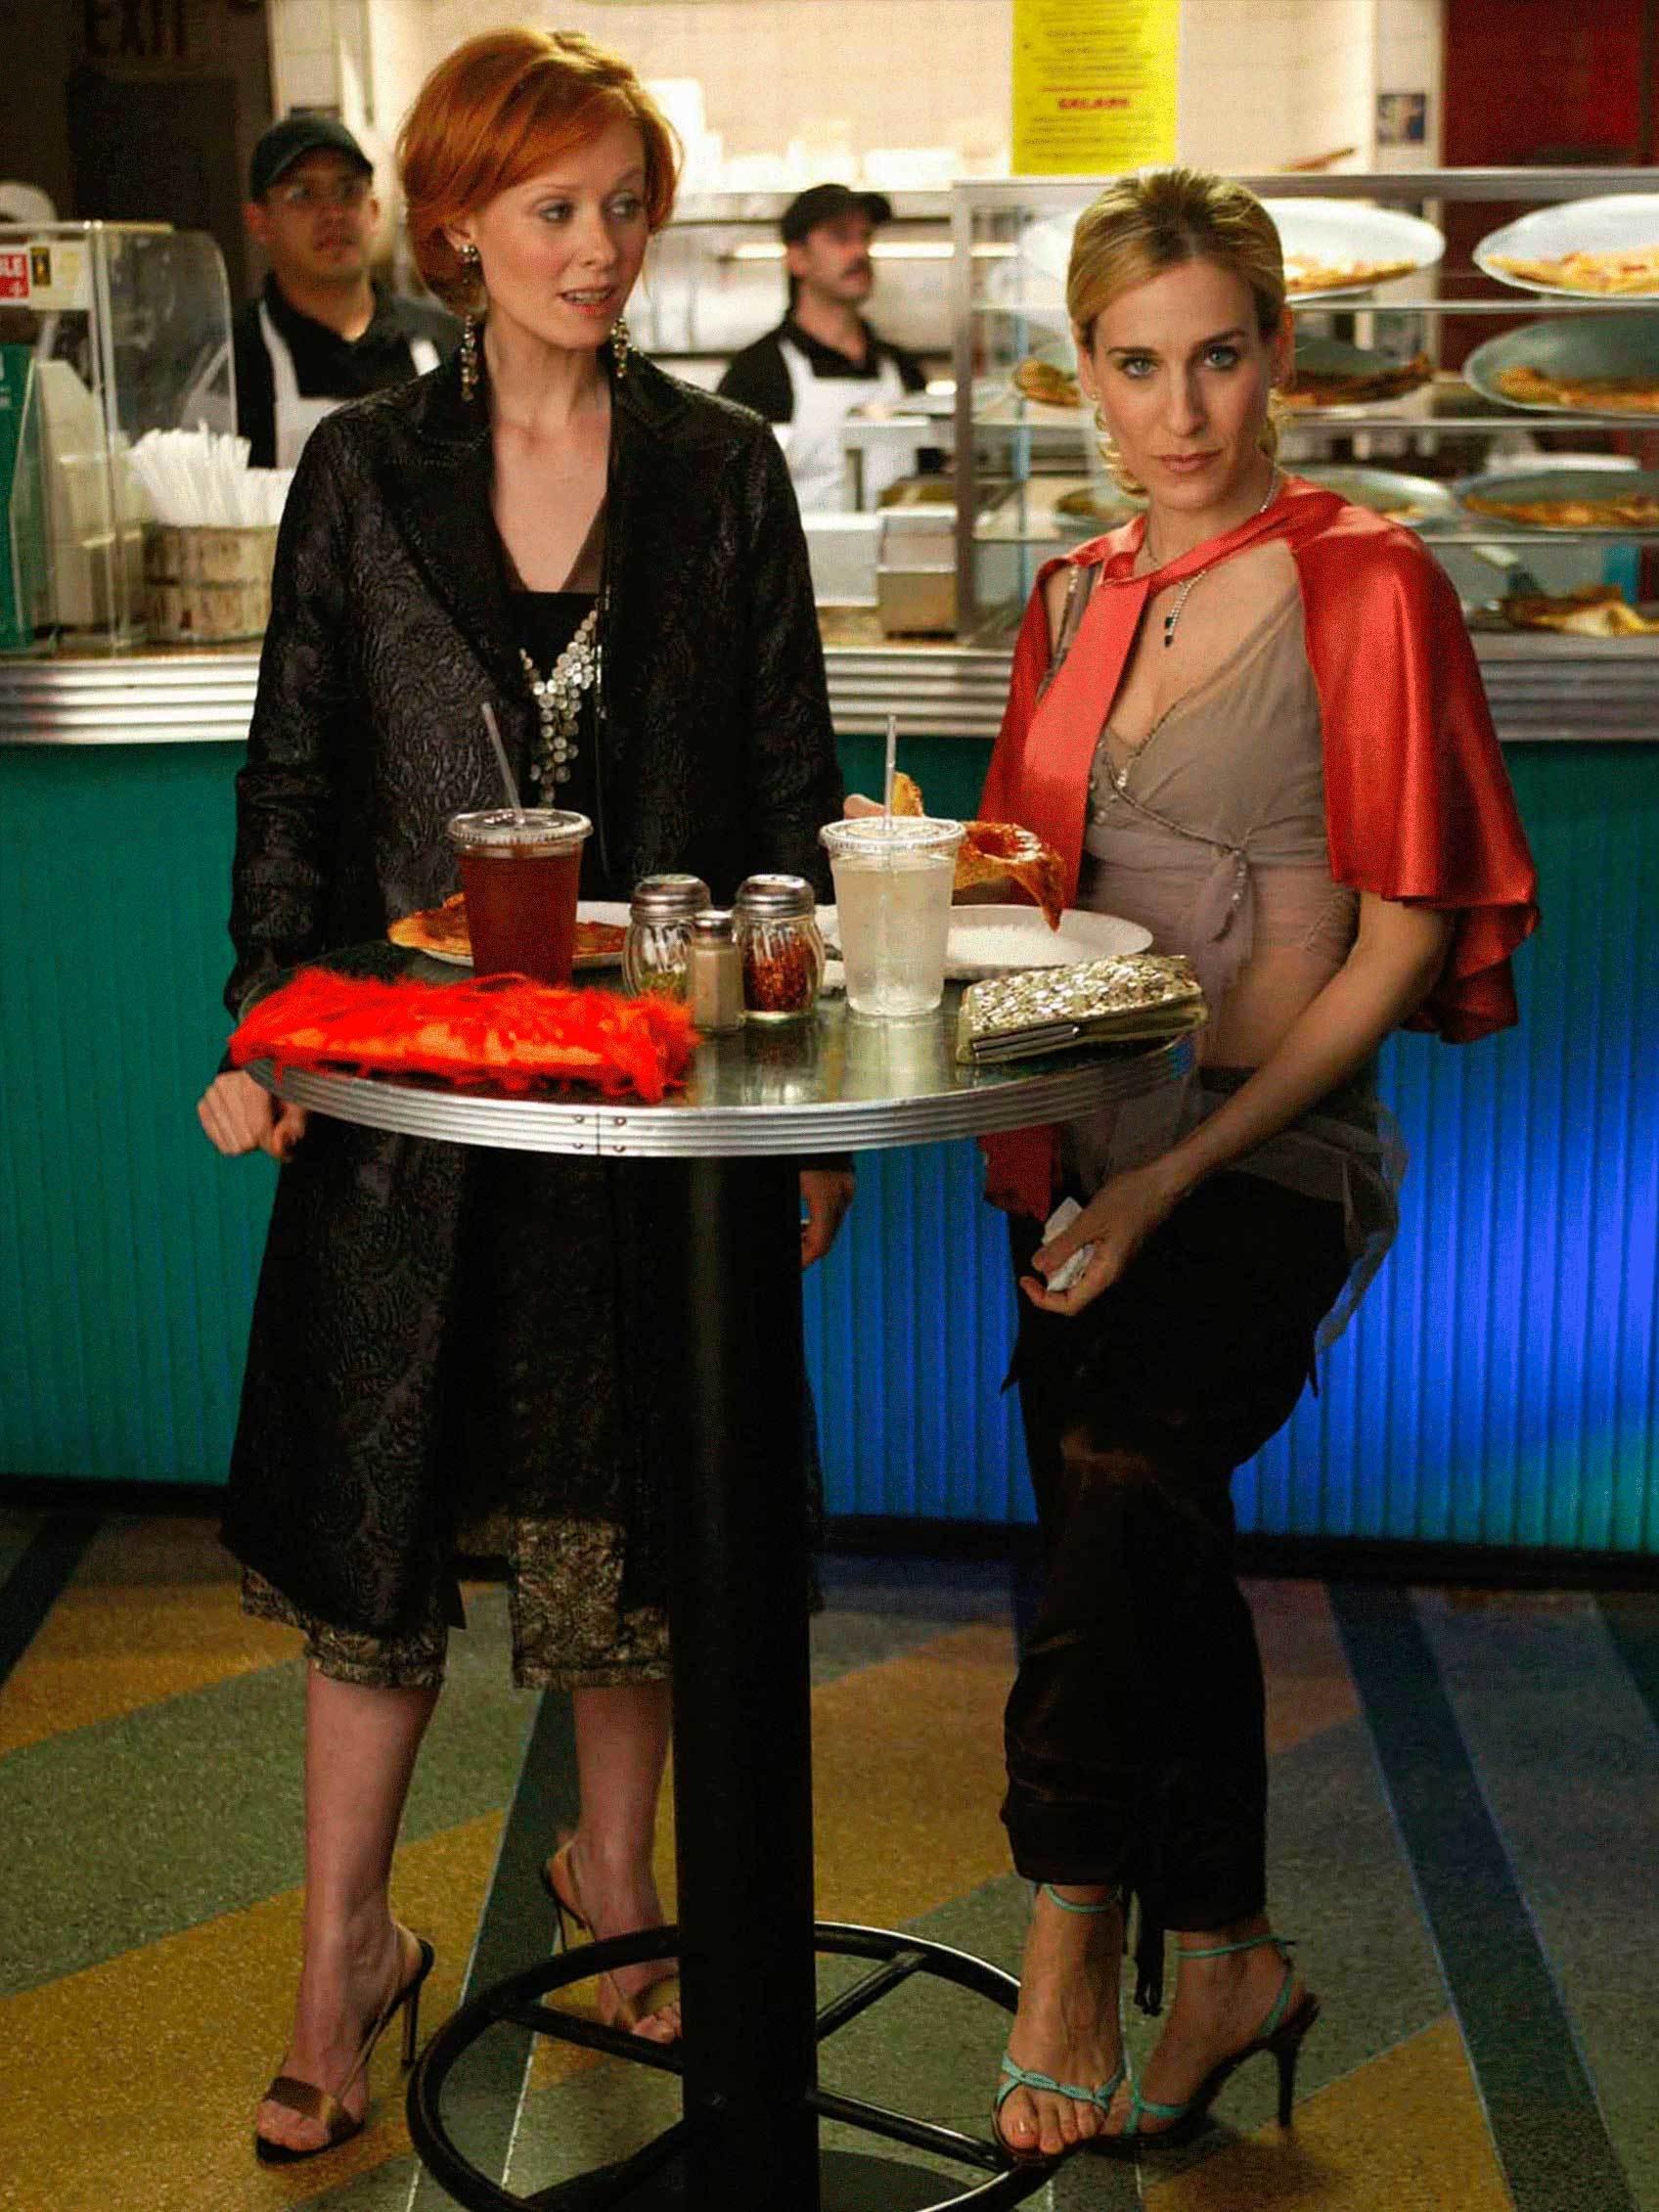 Carrie Bradshaw con las famosas sandalias.